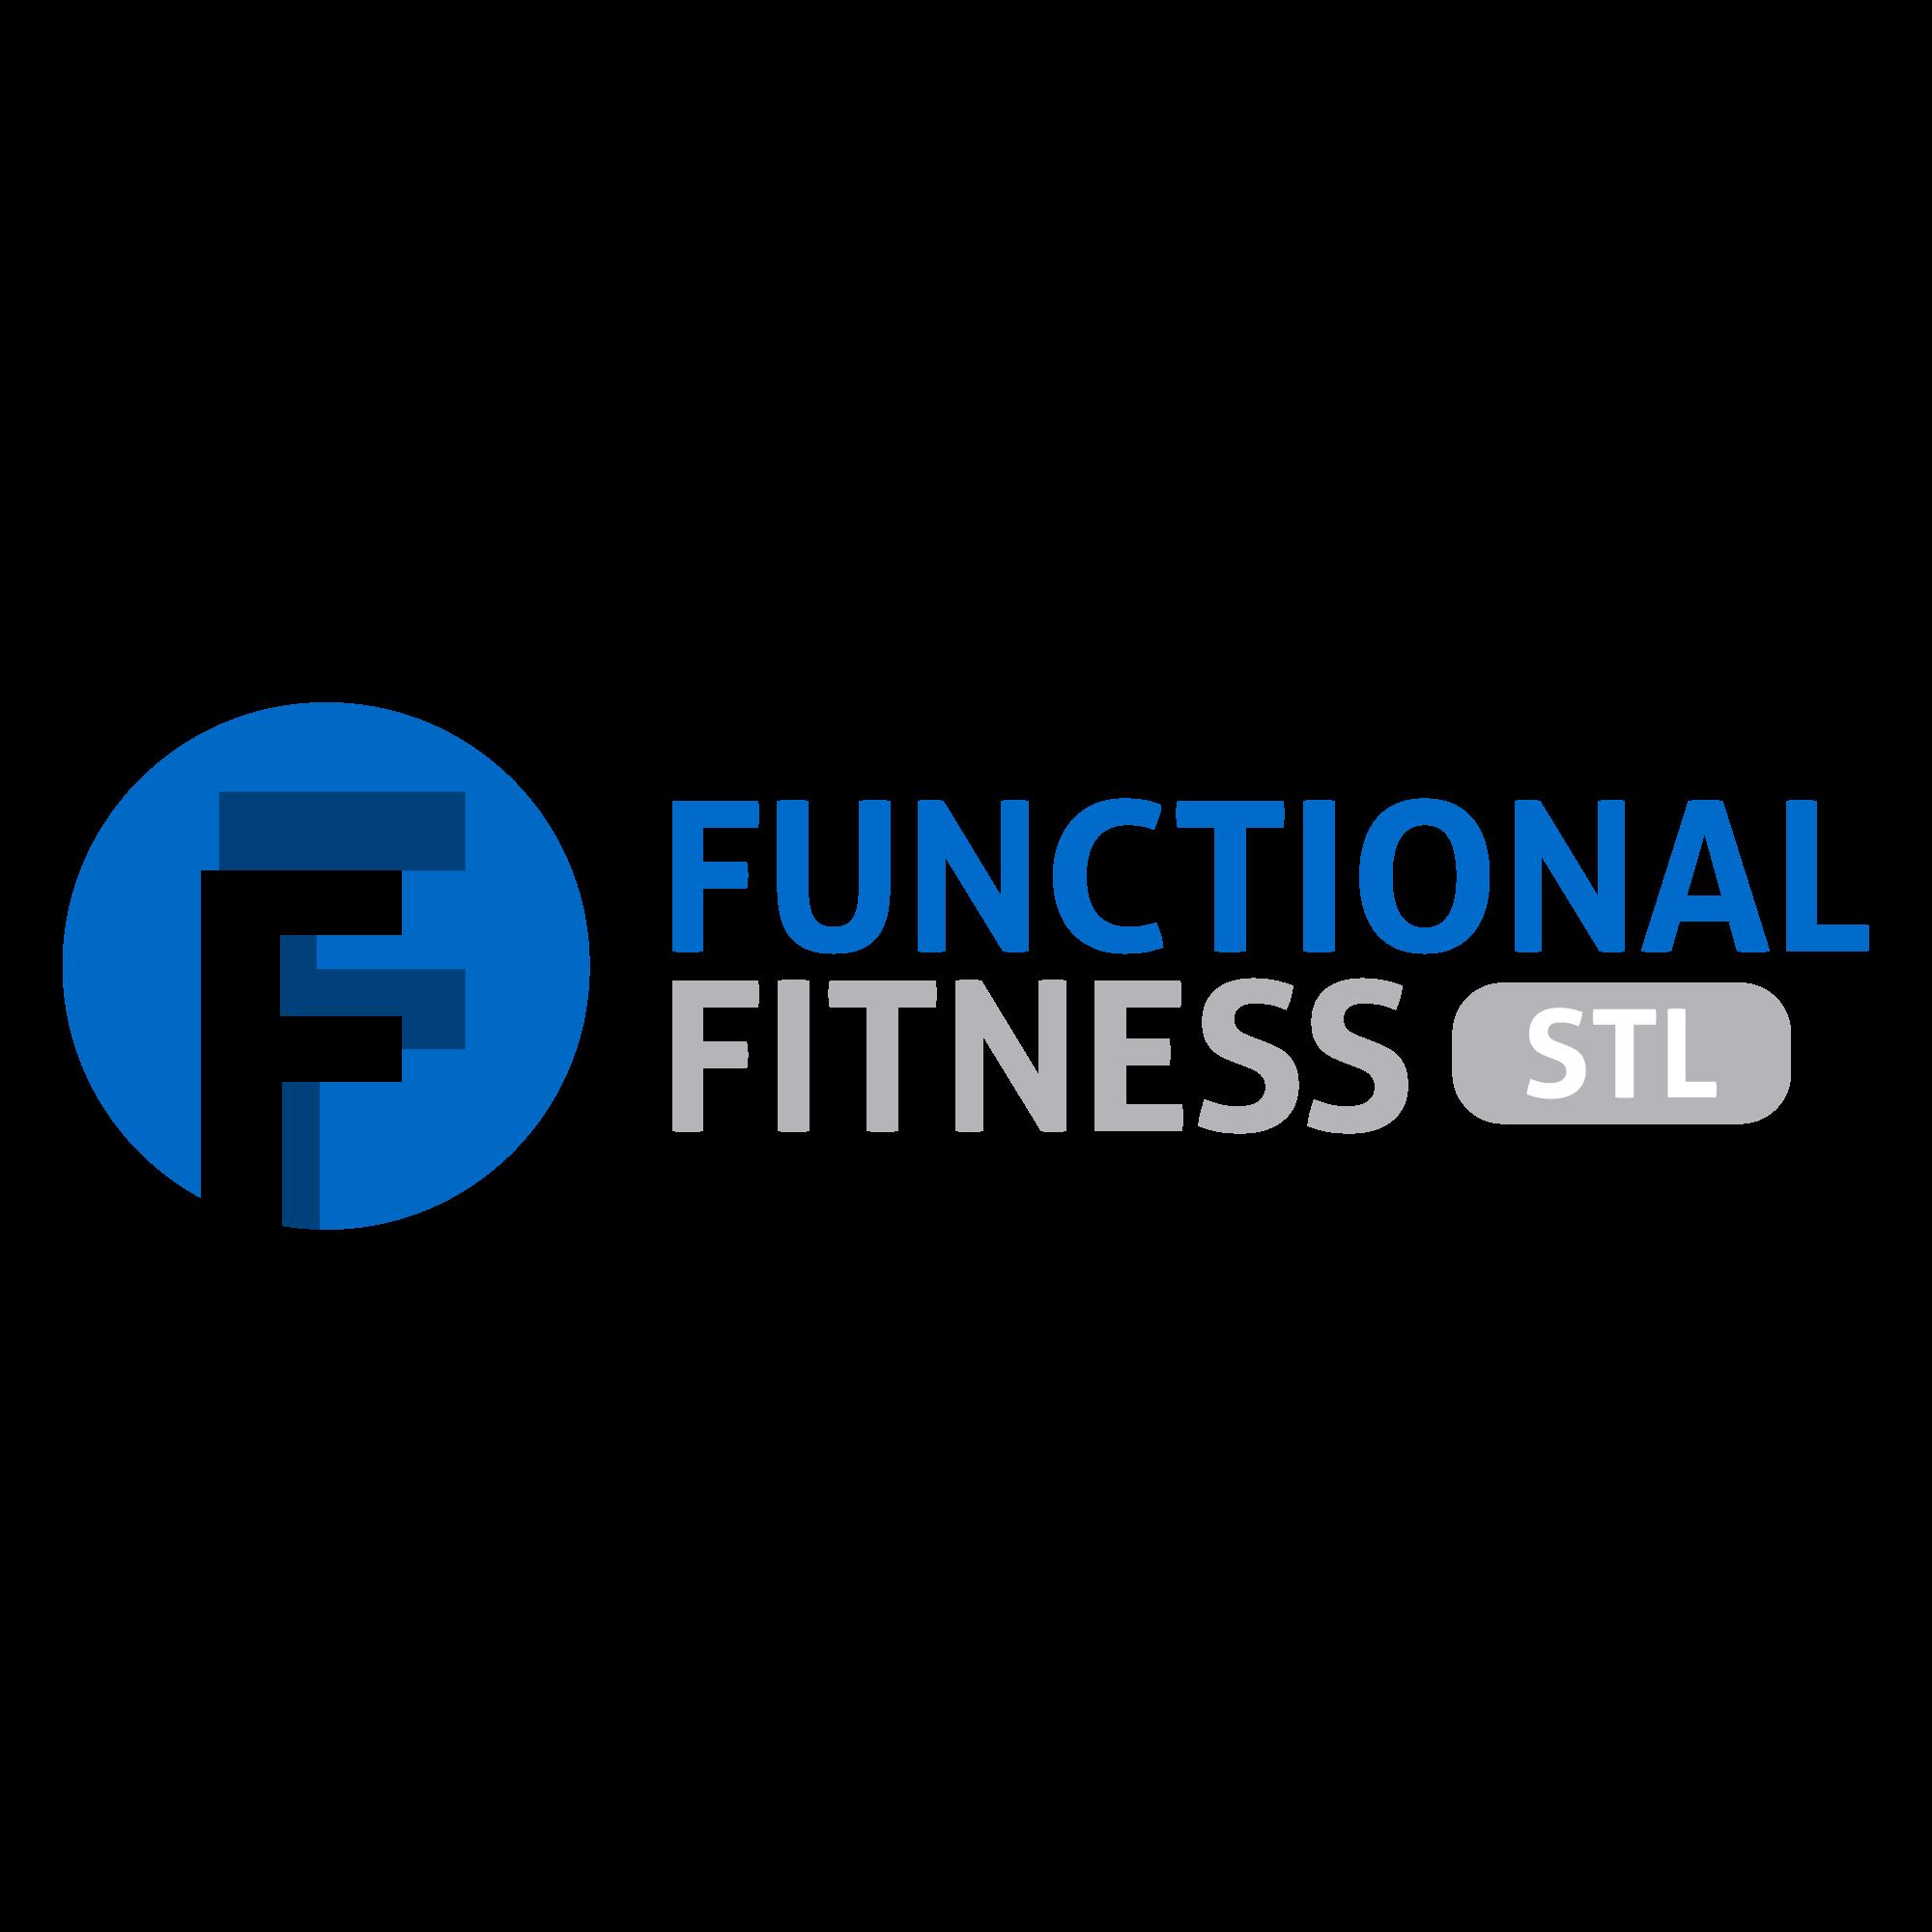 FunctionalFitnessStLLogoF.png